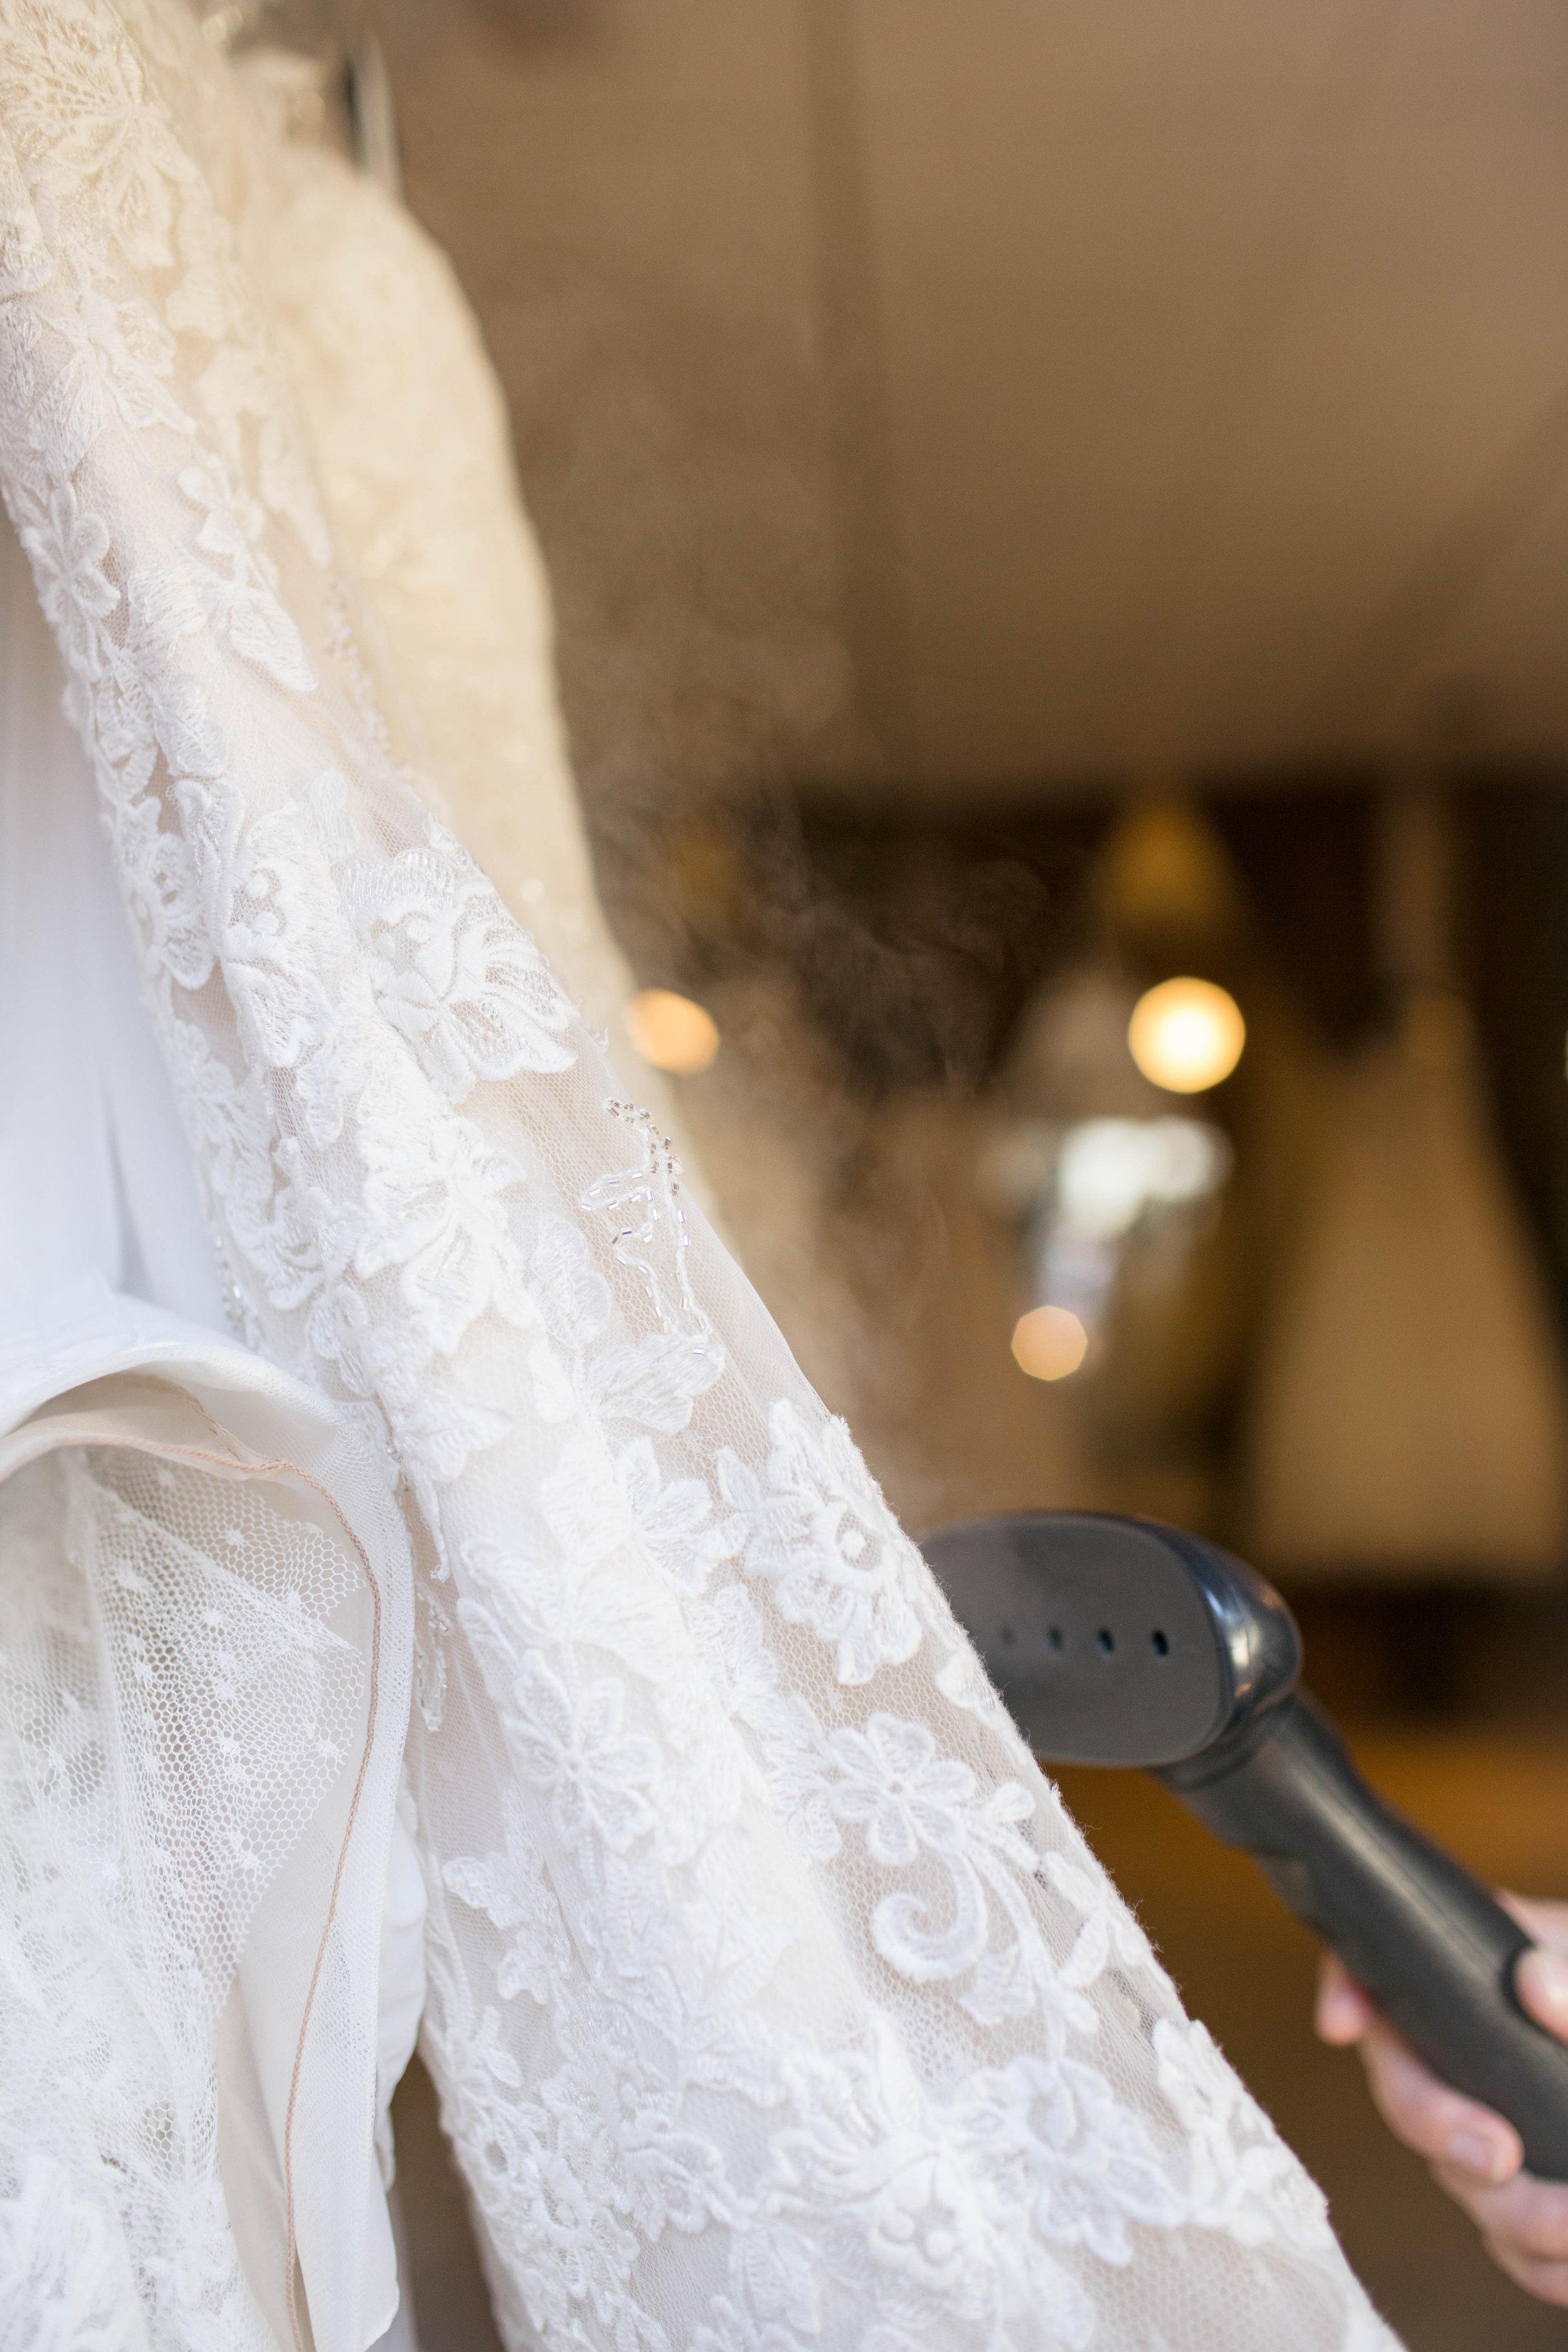 wedding-dress-steaming-and-pressing.jpg